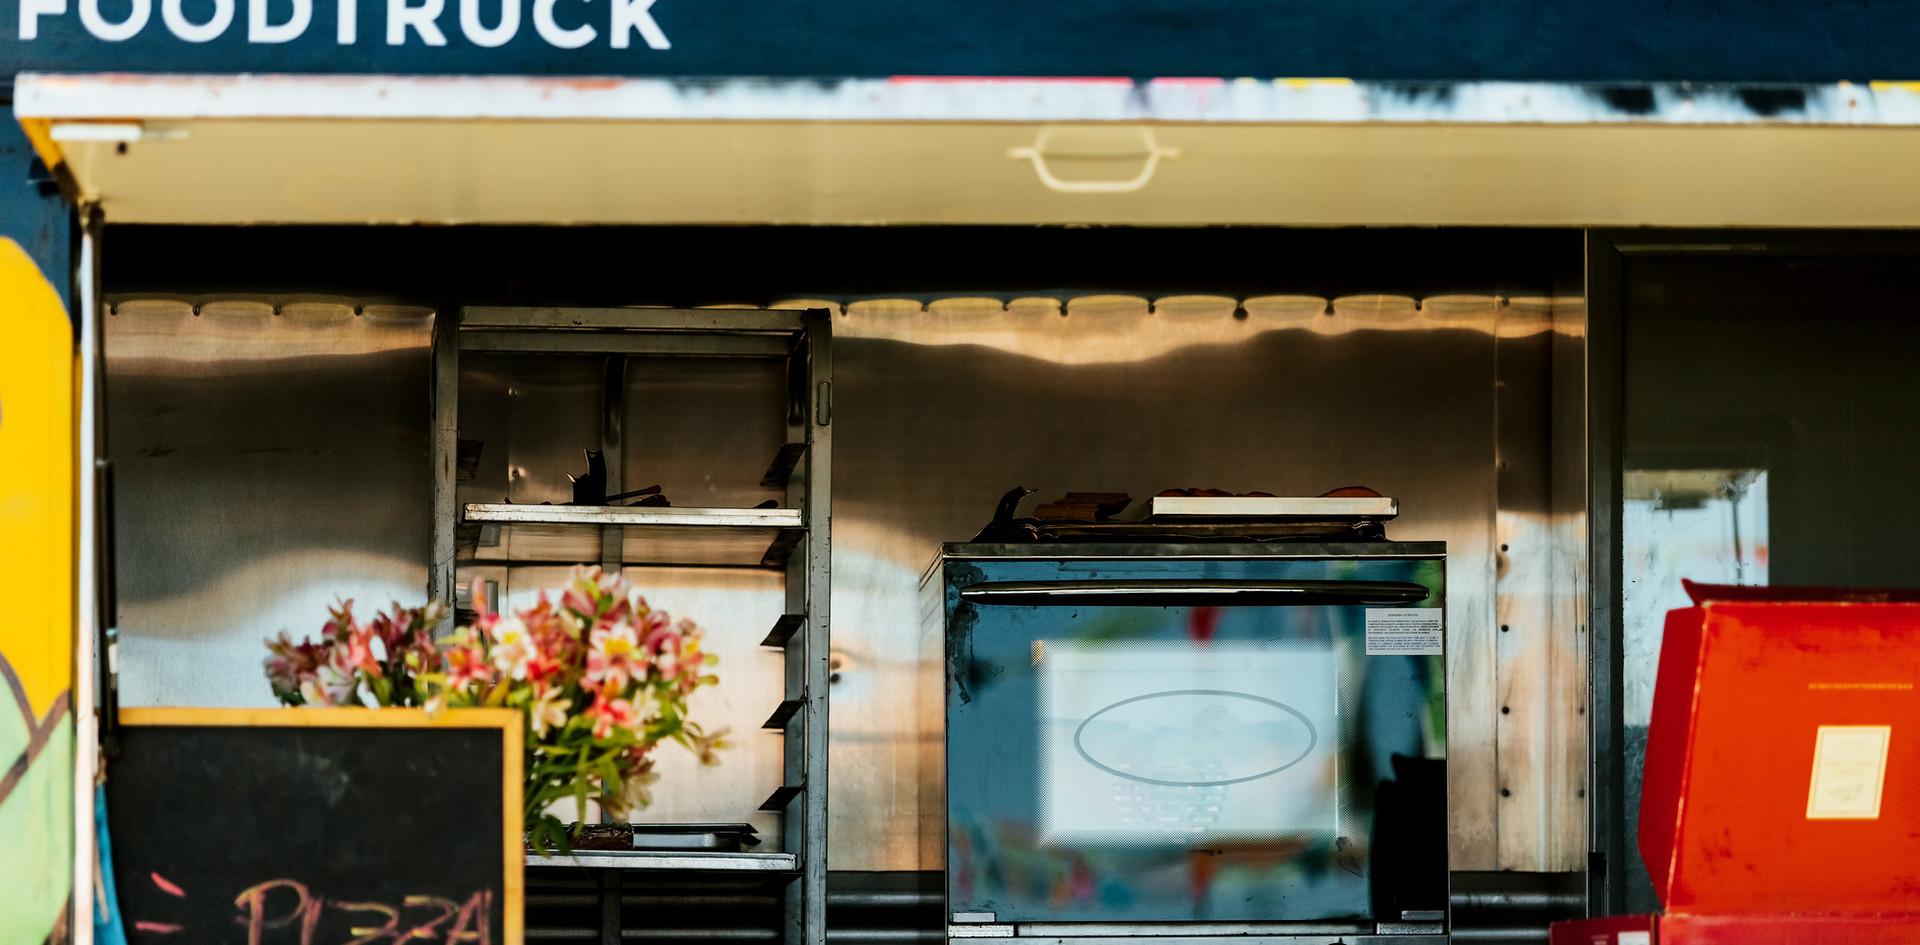 Standby Food Truck.jpeg